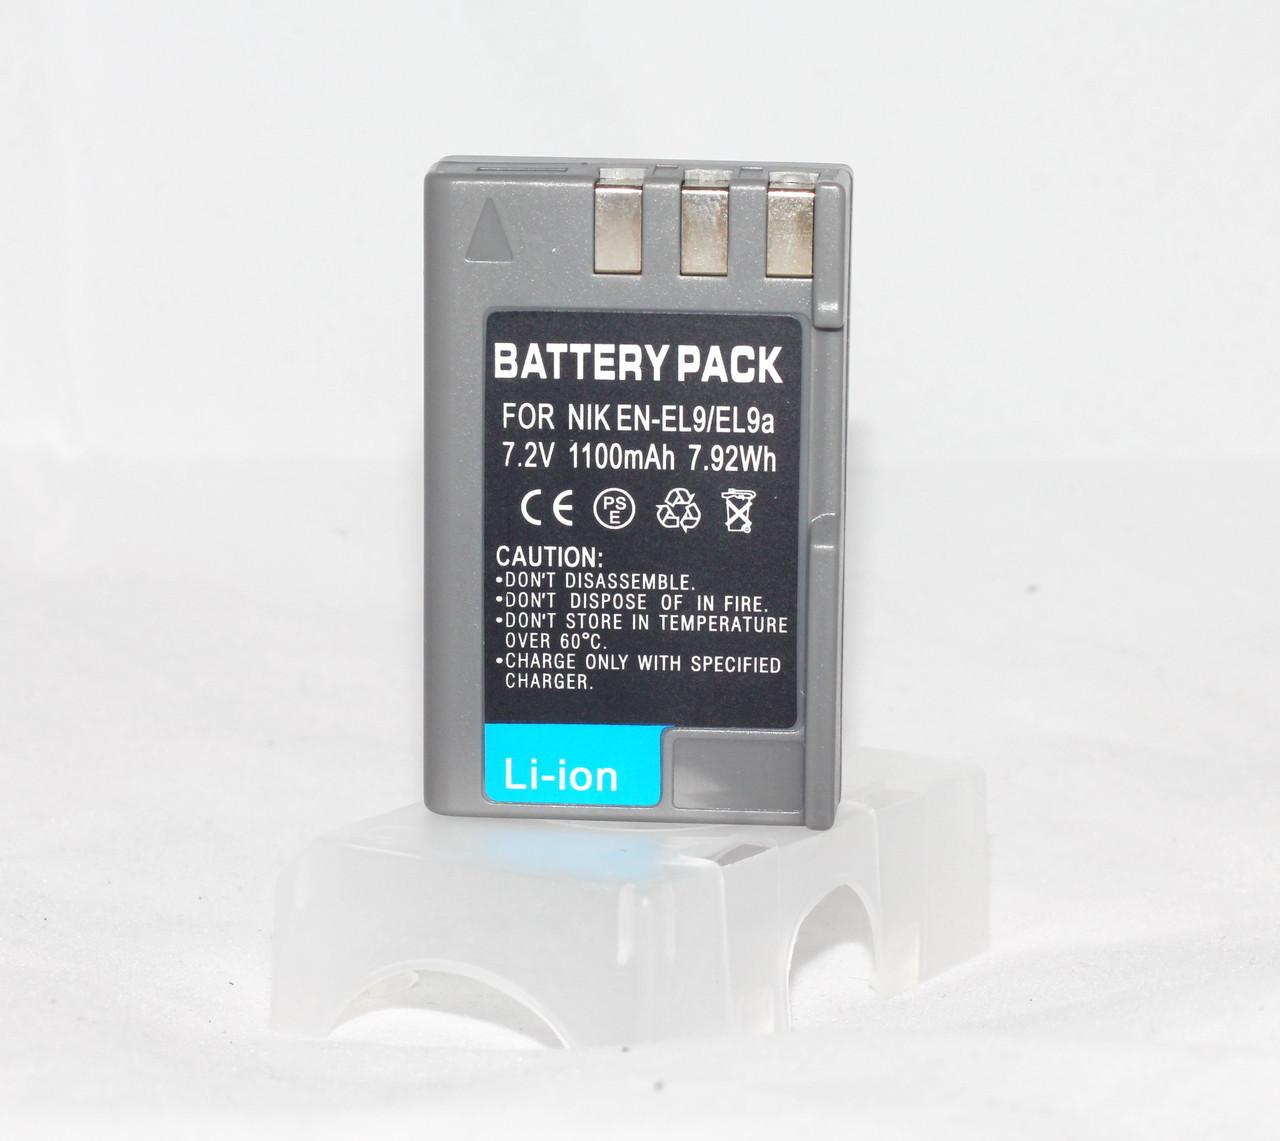 Аккумулятор для фотоаппаратов NIKON D40, D60, D40x, D3000, D5000, D3x - EN-EL9a (аналог) - 1100 ma